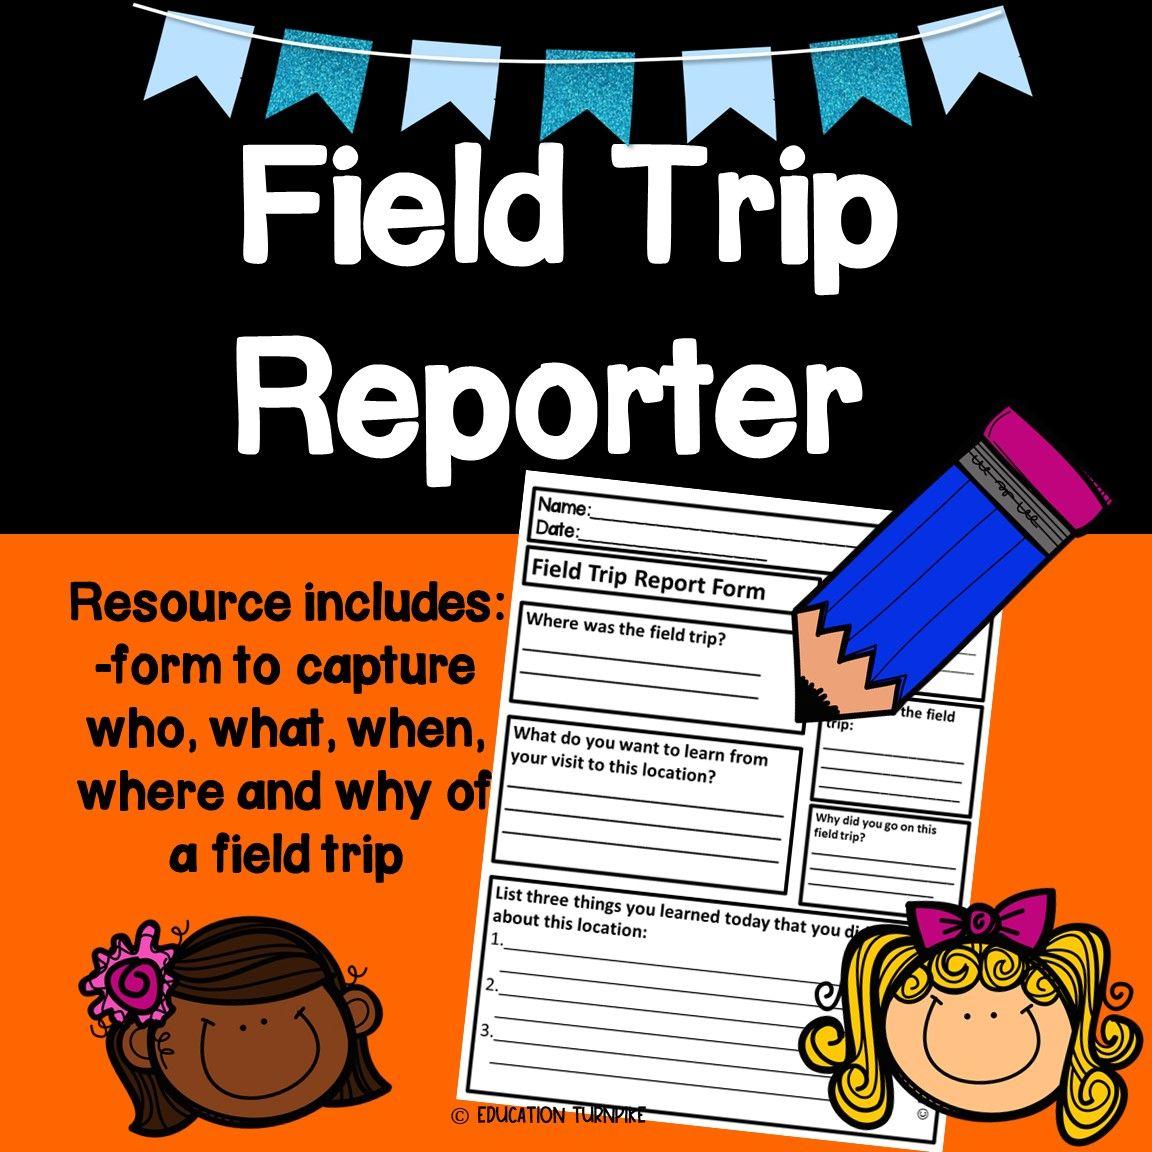 Field Trip Reporting Form